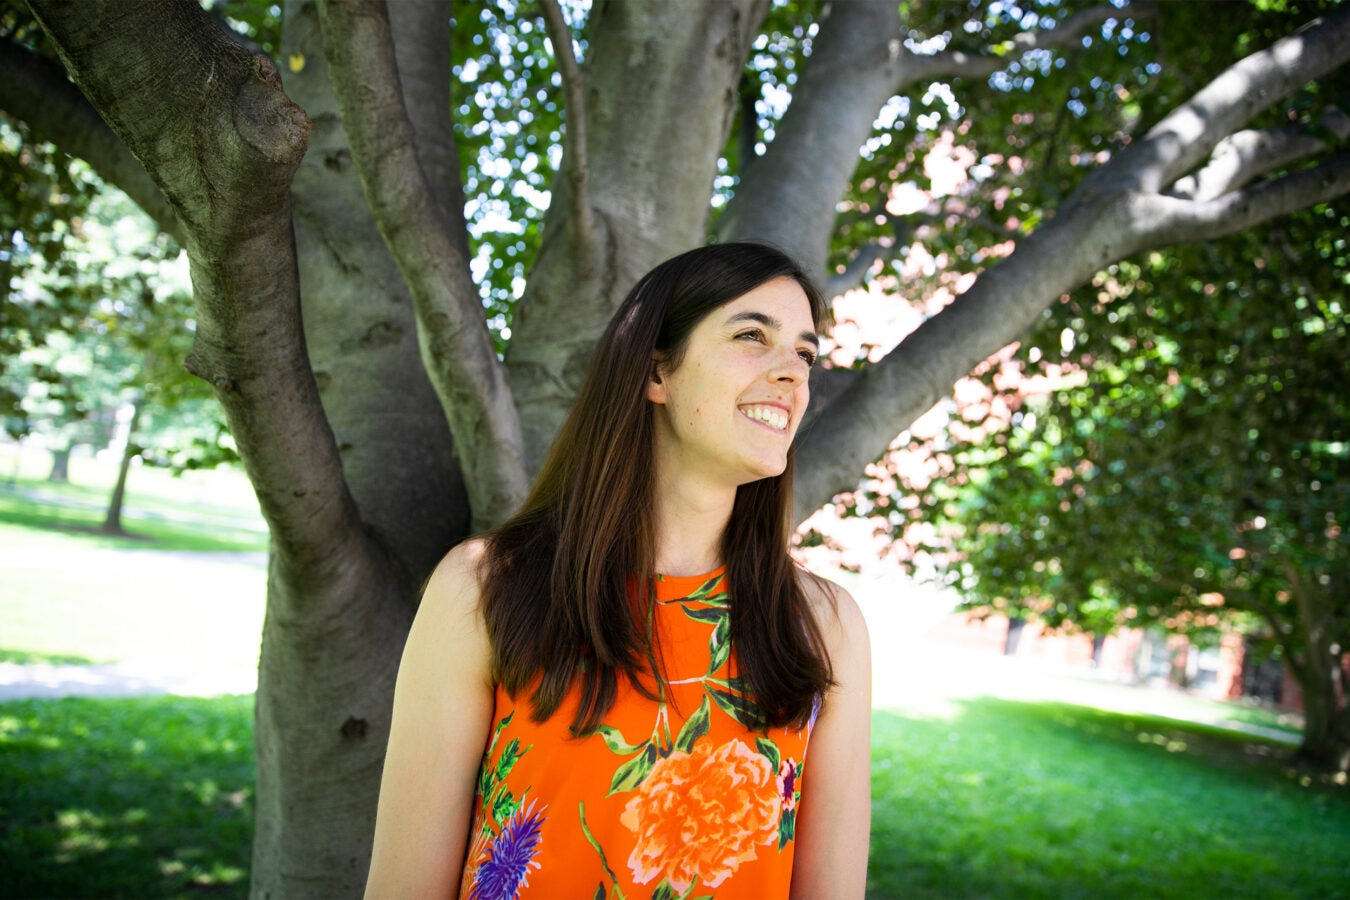 Dakota McCoy outside by a tree.